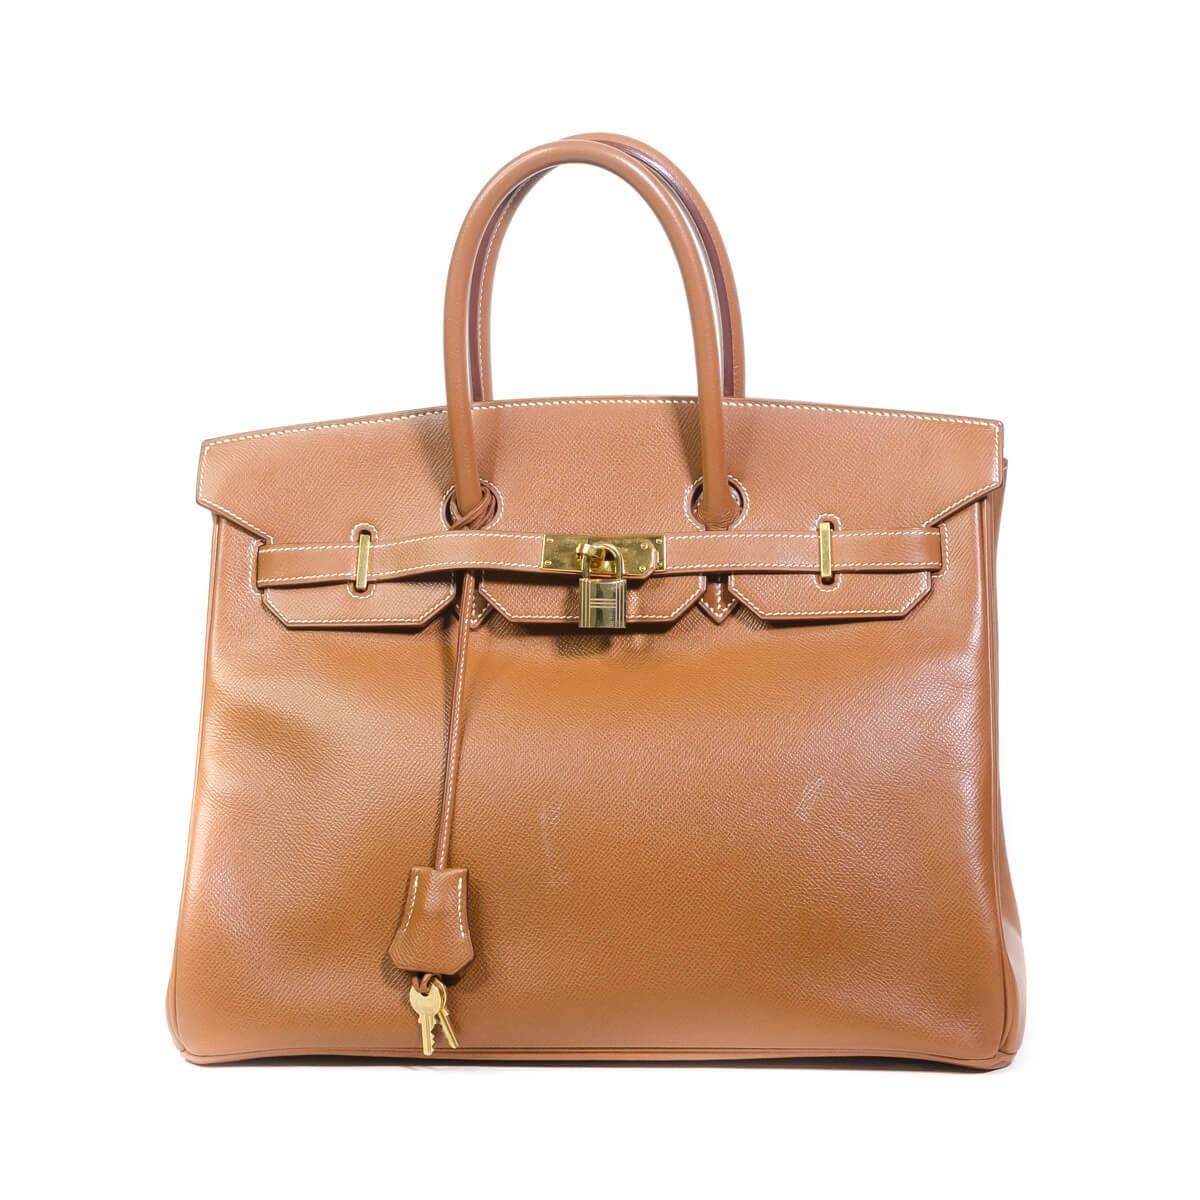 34630aaf3b Birkin 35 Bag Caramel Togo